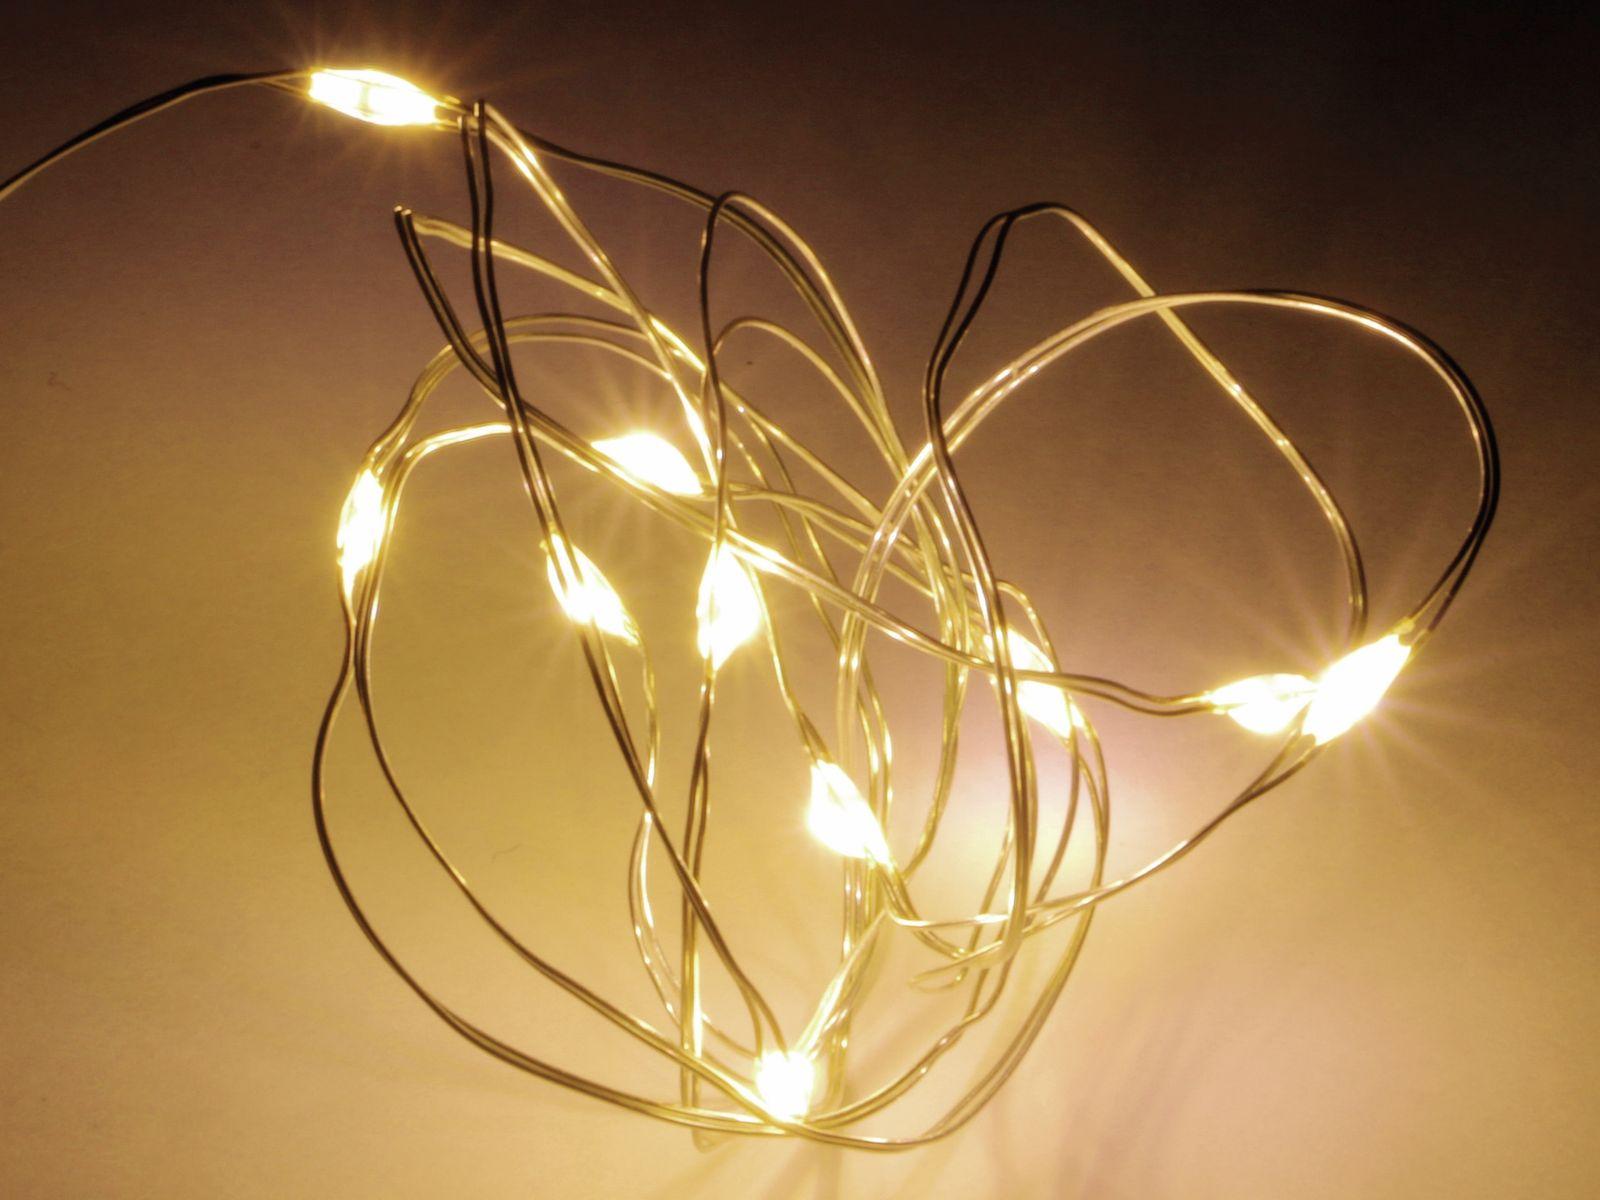 Led lichterkette silberdraht 10 leds warmwei - Silberdraht kaufen ...